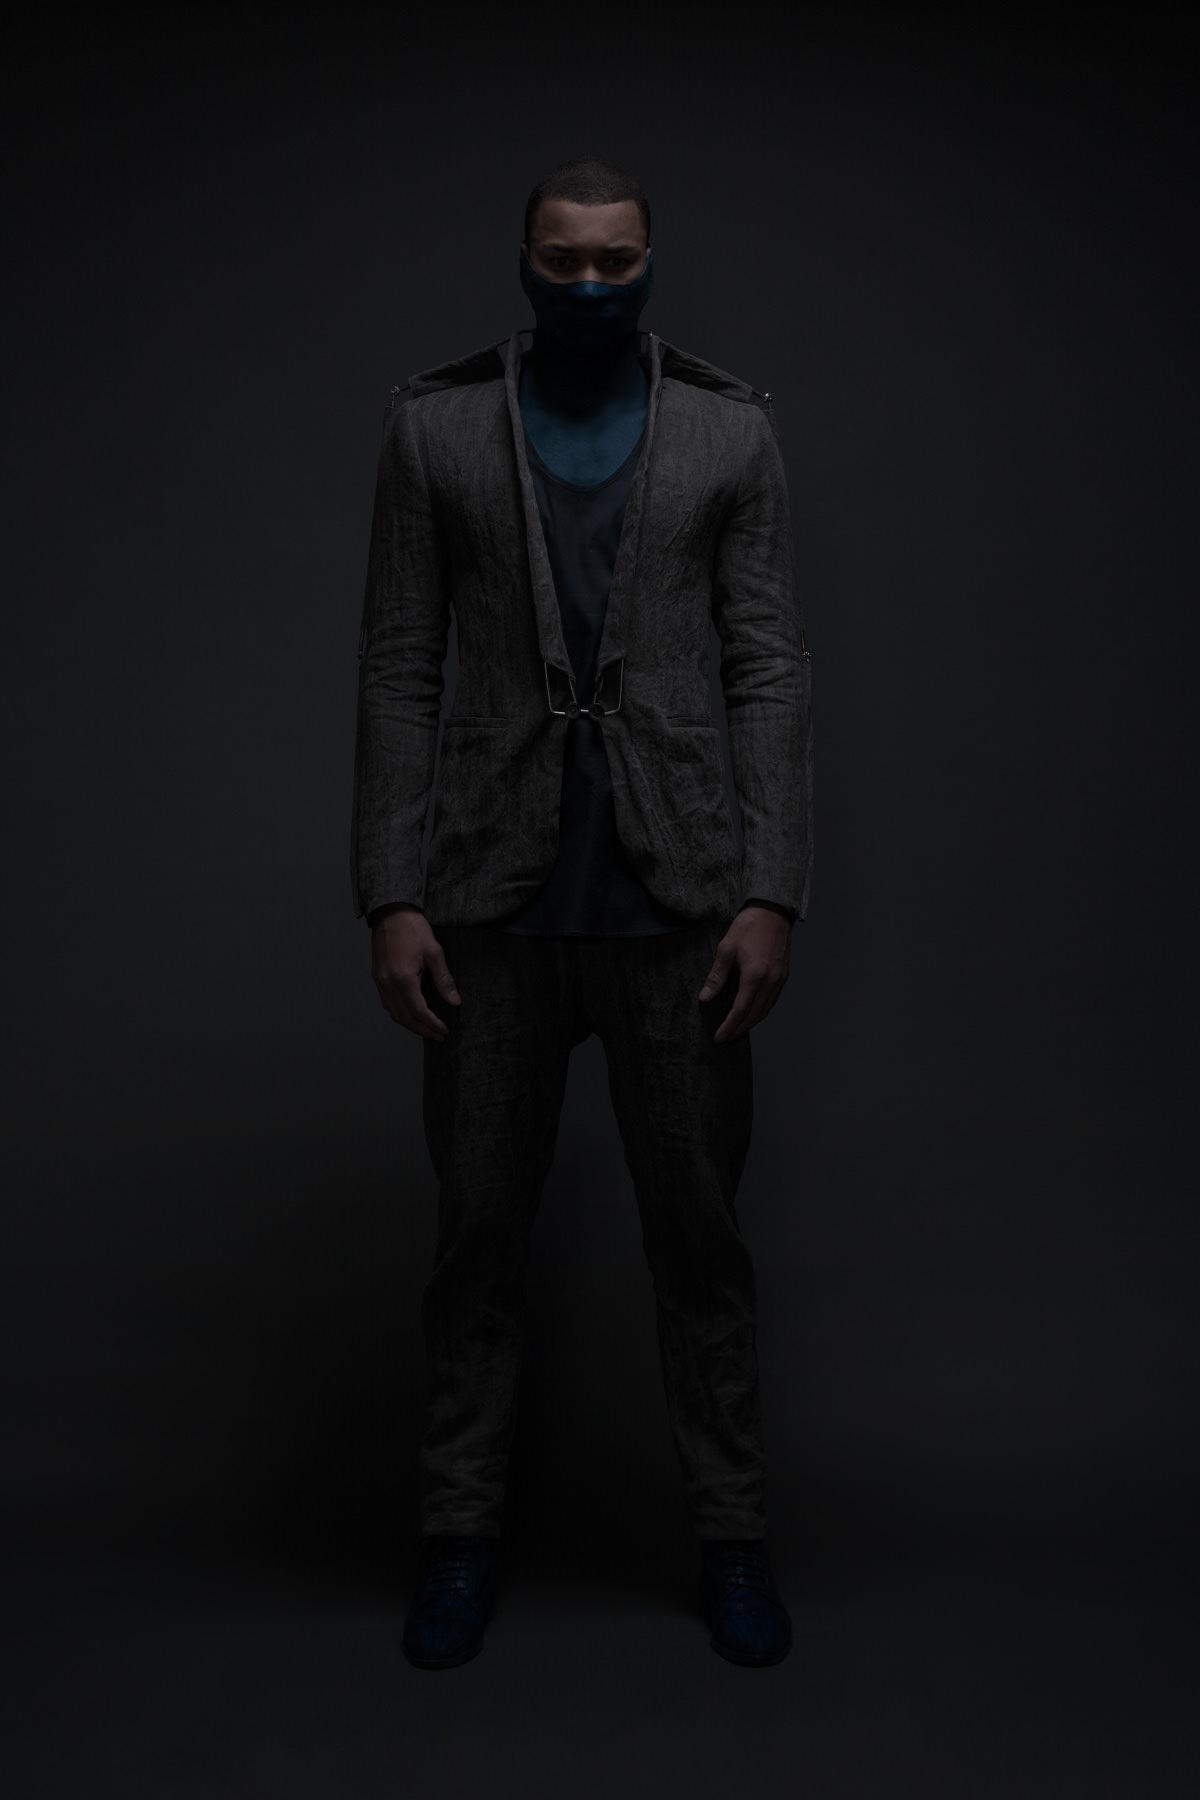 mode lukas fischer superior superhelden maske studio dunkel skelett grau blau mann duster exoskelett jörn strojny